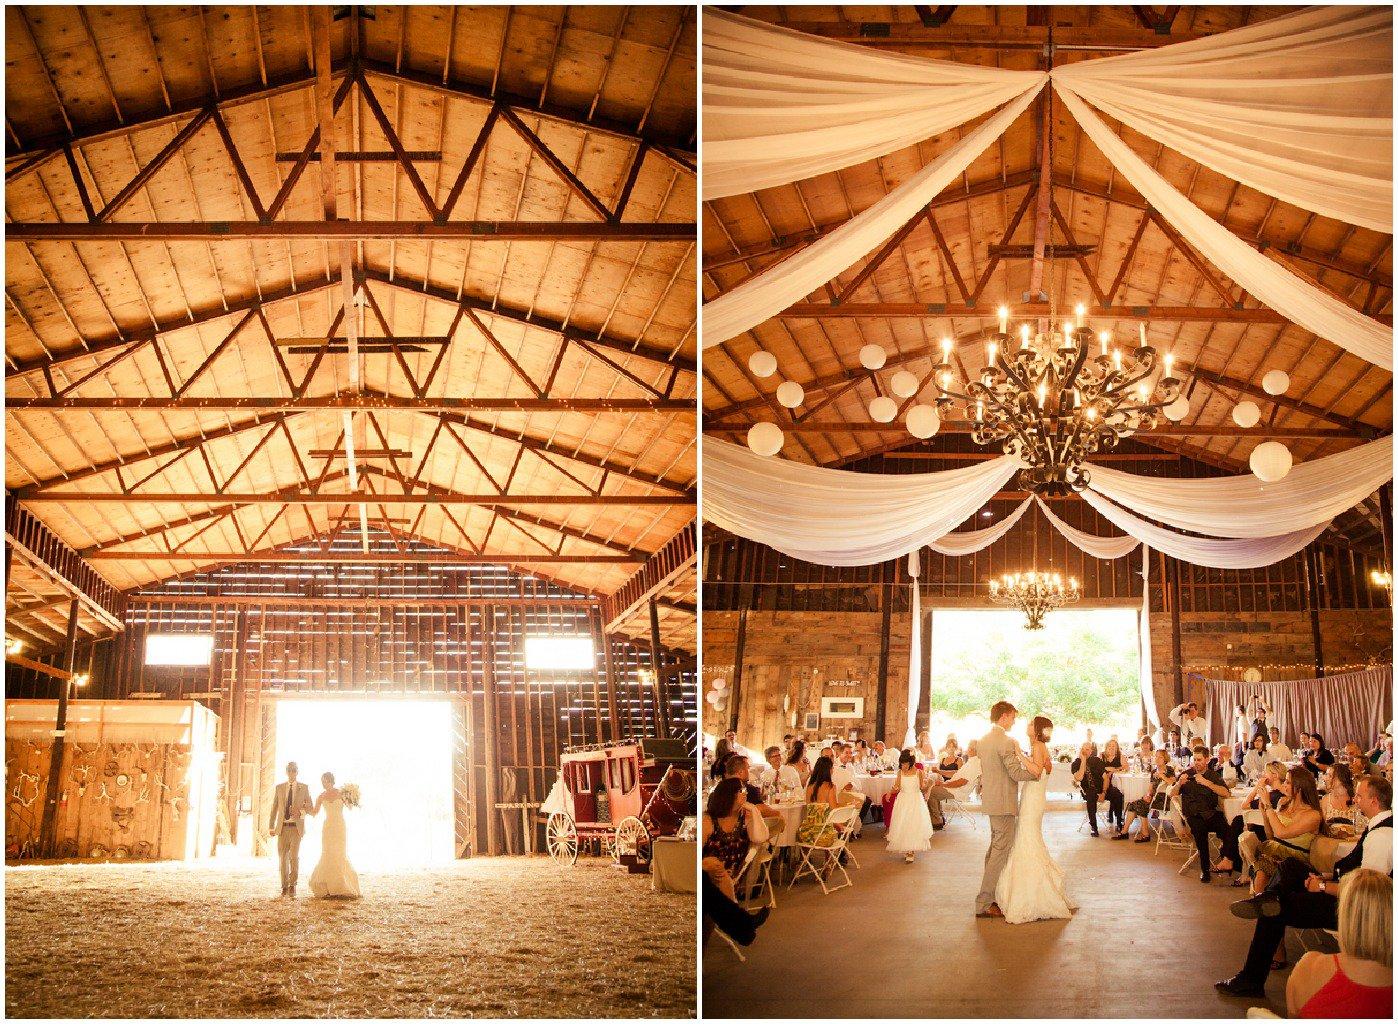 Dream Wedding Venues Past Present And Future